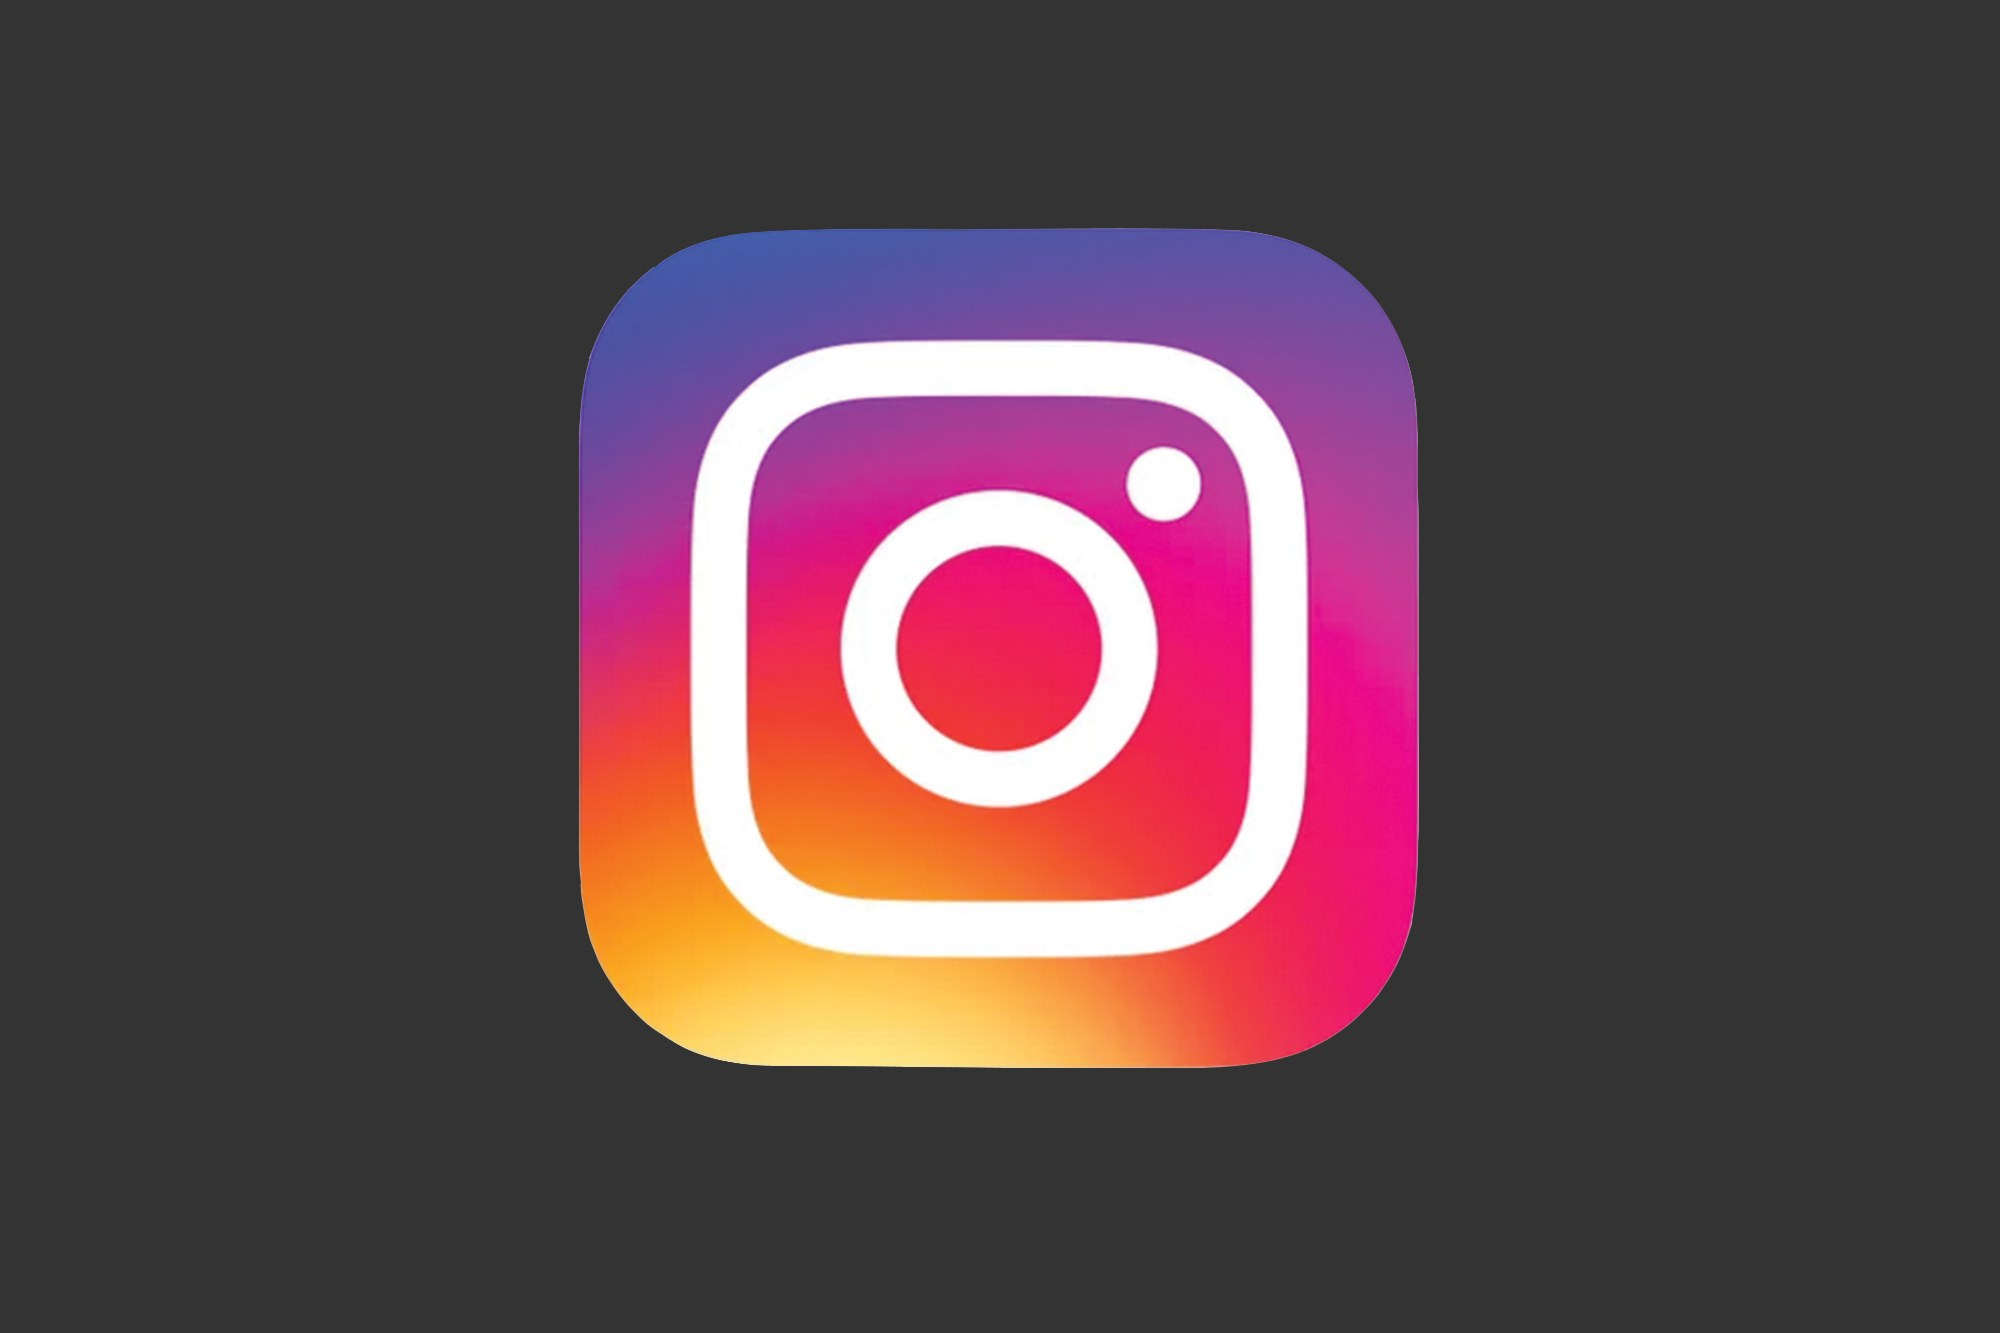 instagram apk файл